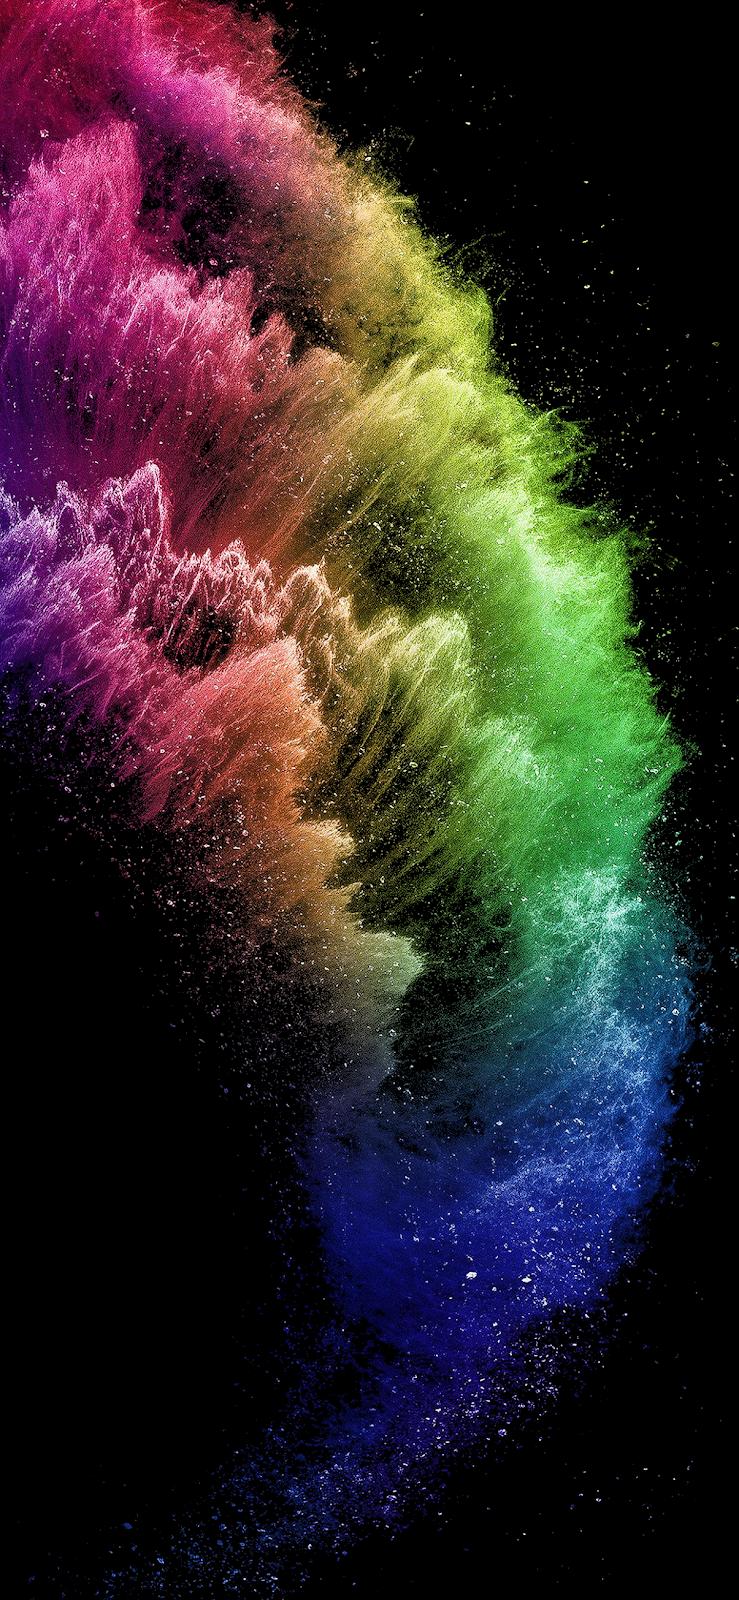 Fondos De Pantalla Iphone 11 Rainbow Wallpaper Iphone Black Wallpaper Iphone Iphone Wallpaper Images